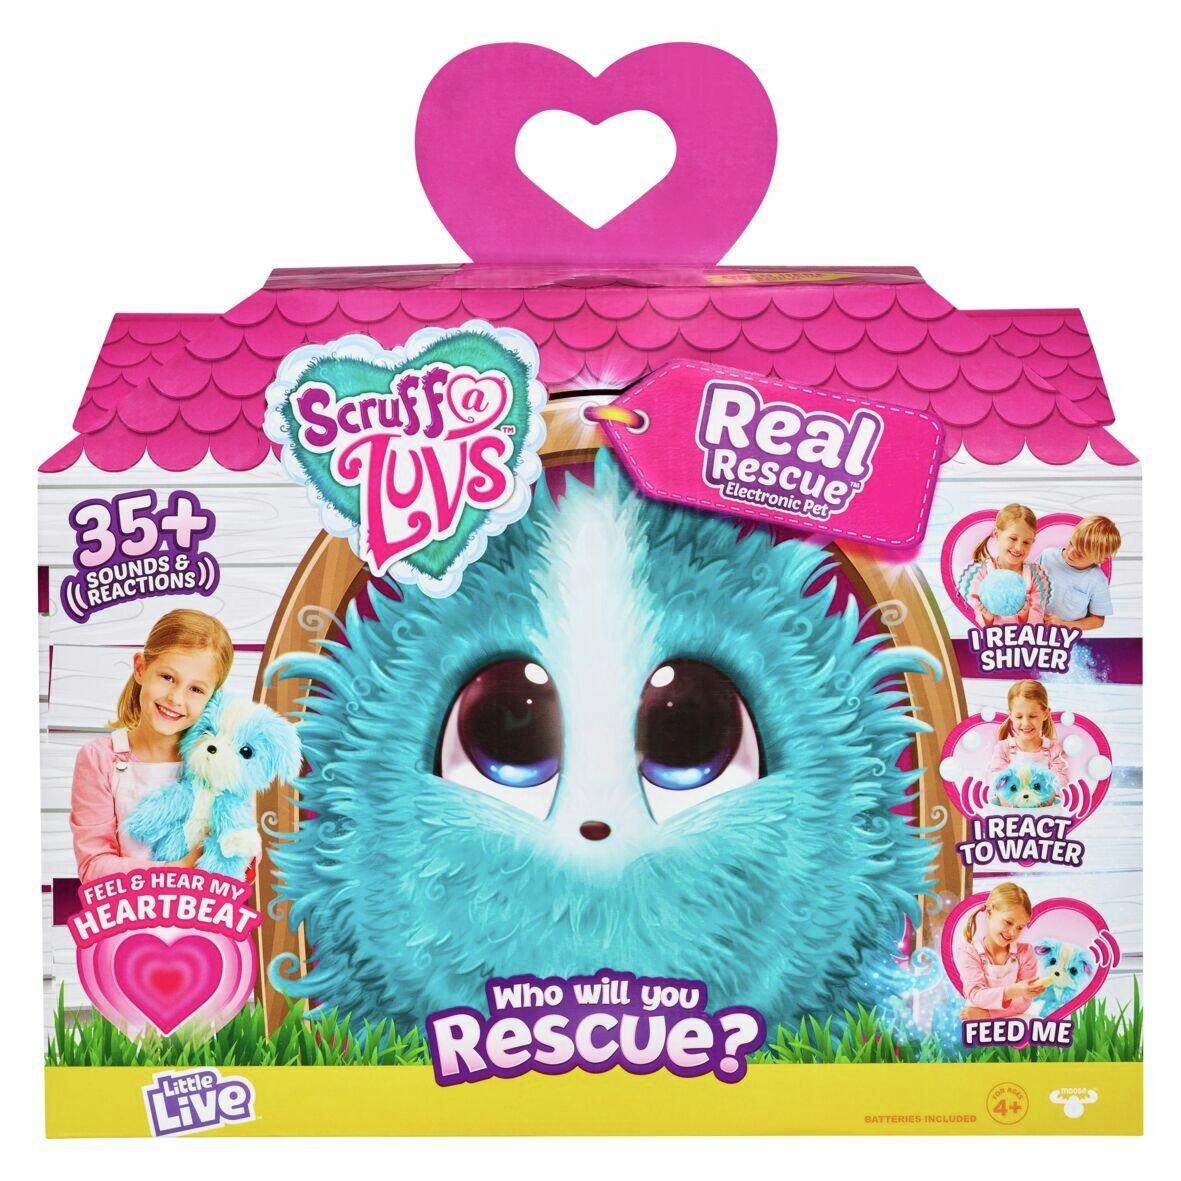 Scruff a Luvs Real Rescue - Surprise Interactive Pet - Aqua